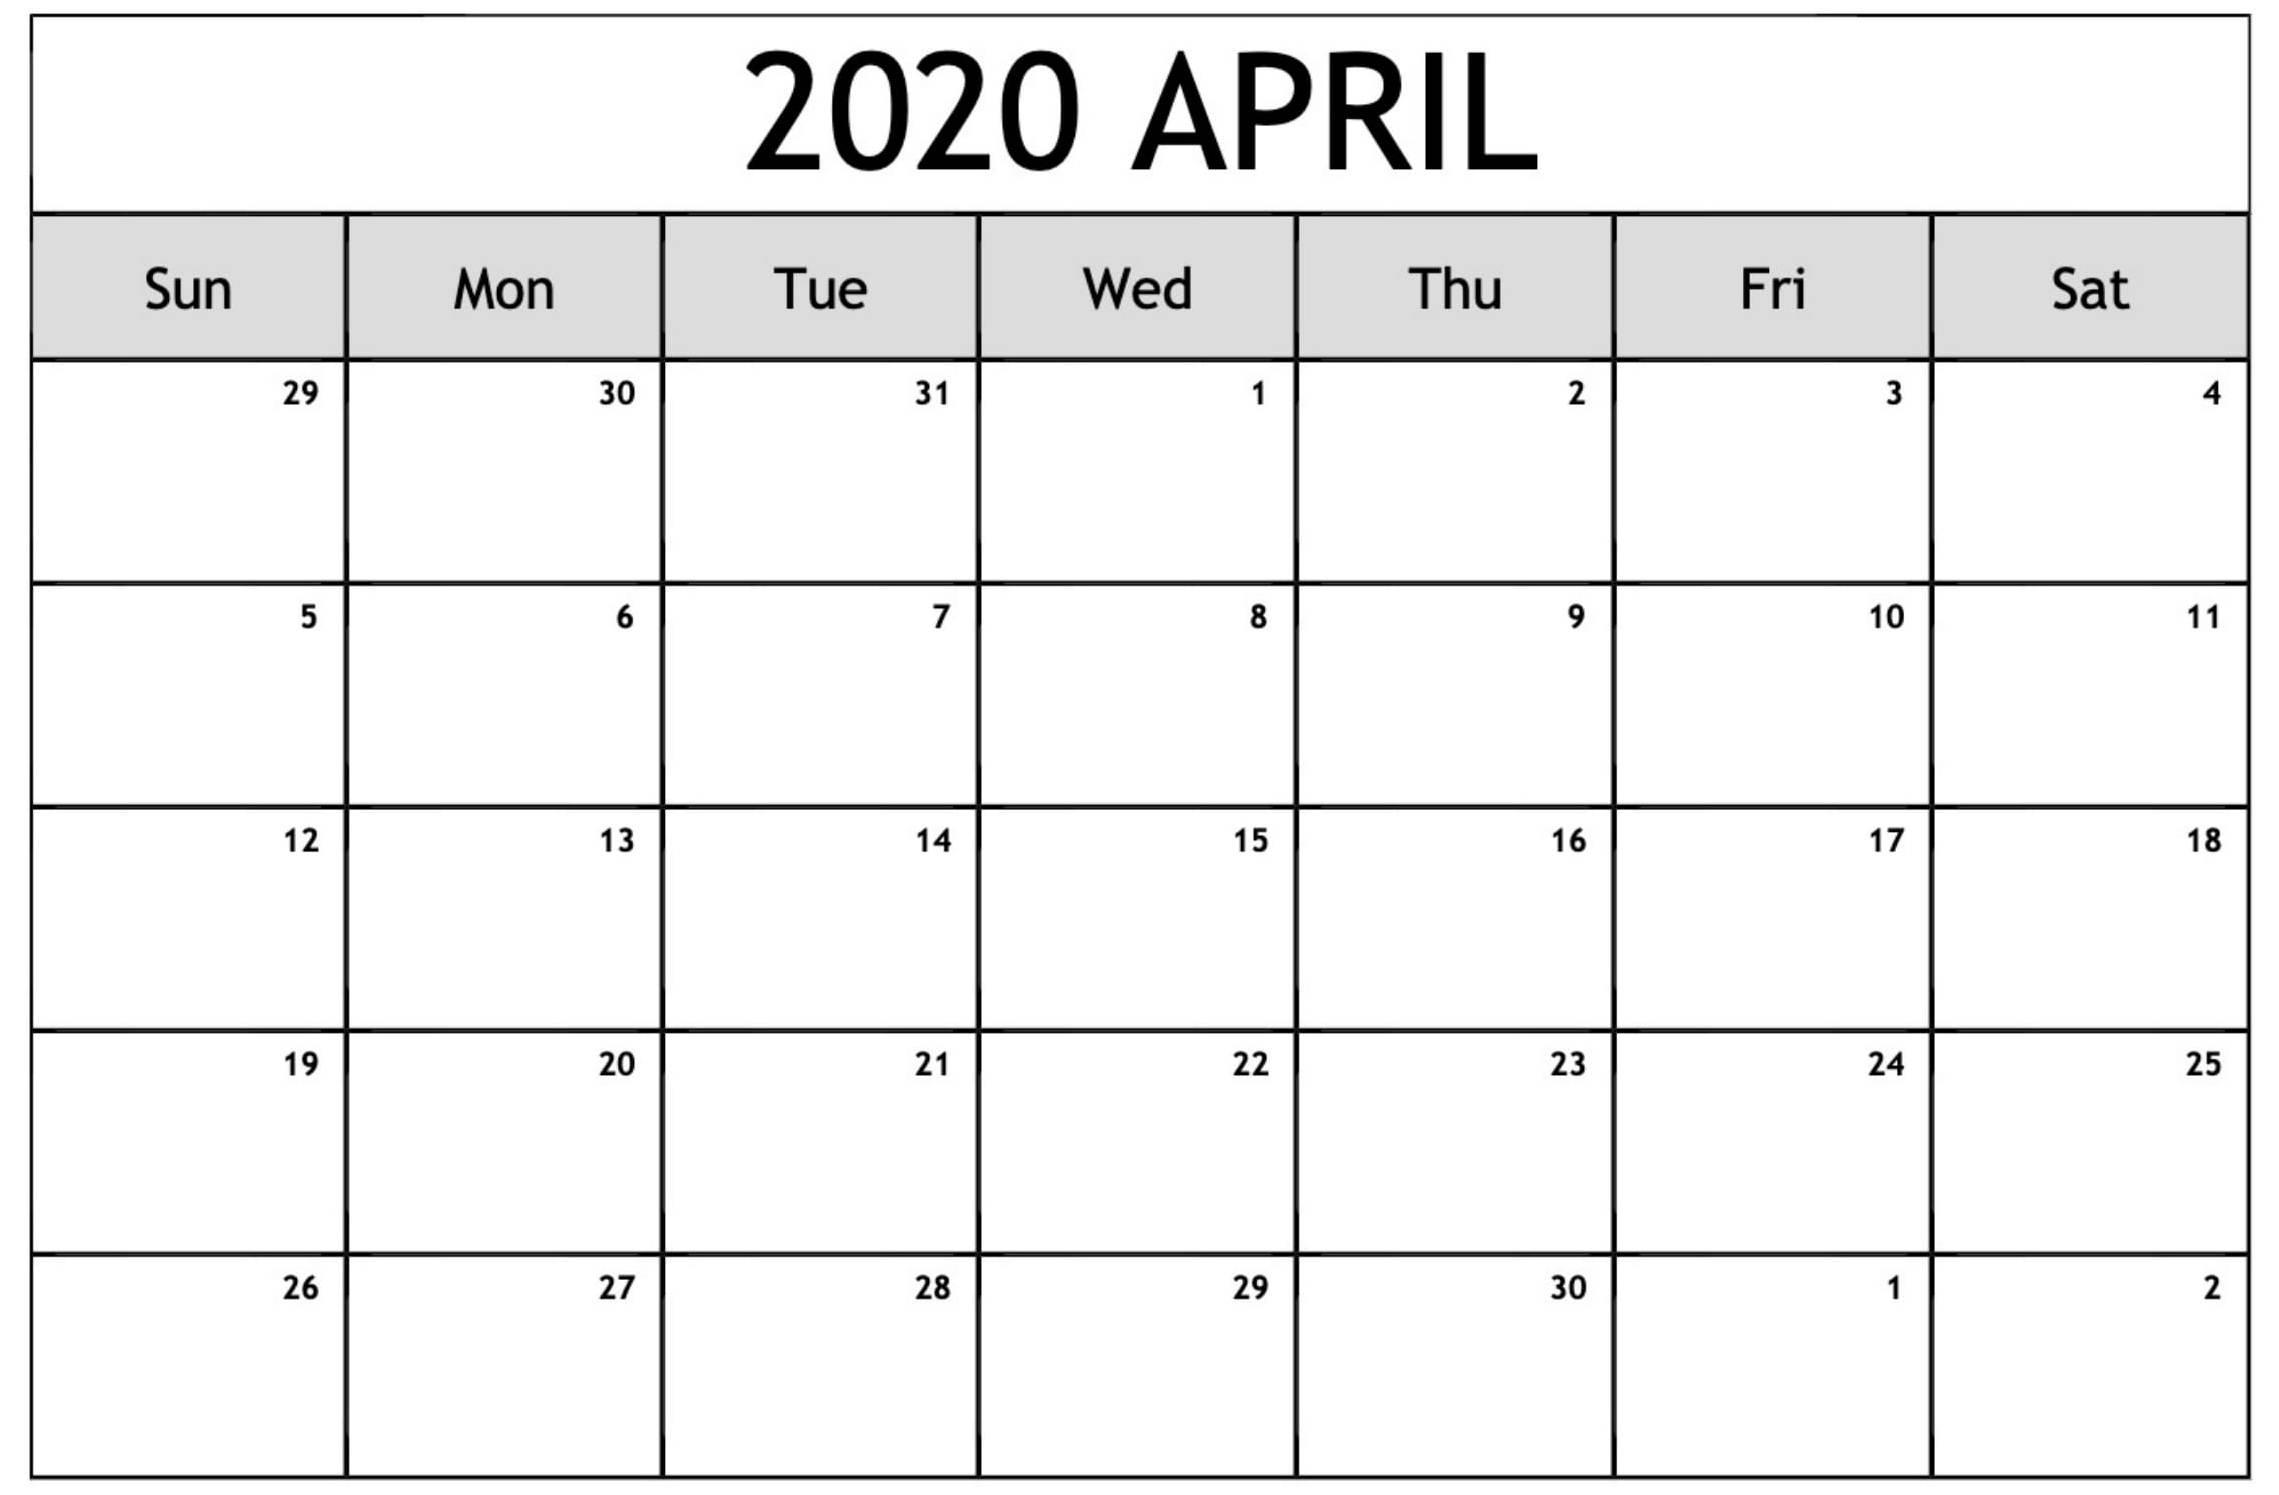 Calendar For April 2020 Printable Template  2019 Calendars with regard to April 2020 Printable Calendar